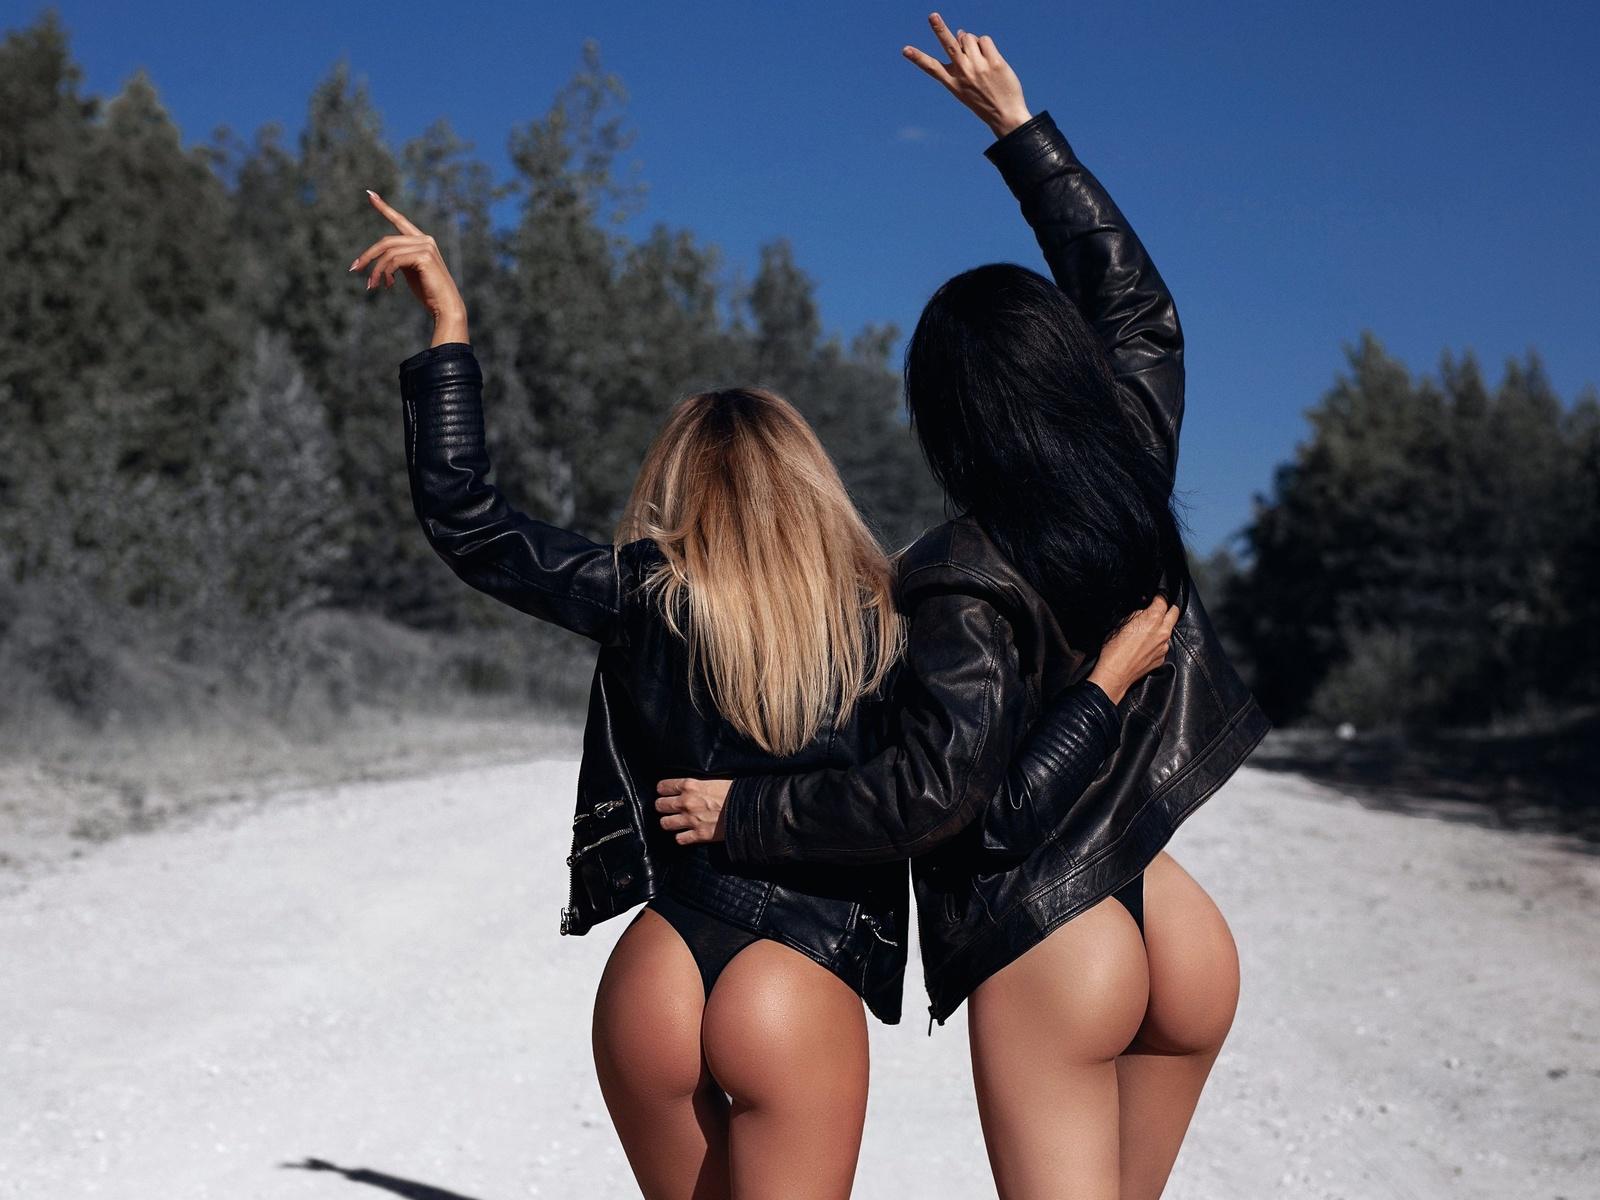 women, leather jackets, ass, road, back, blonde, the gap, black panties, women outdoors, black hair, two women